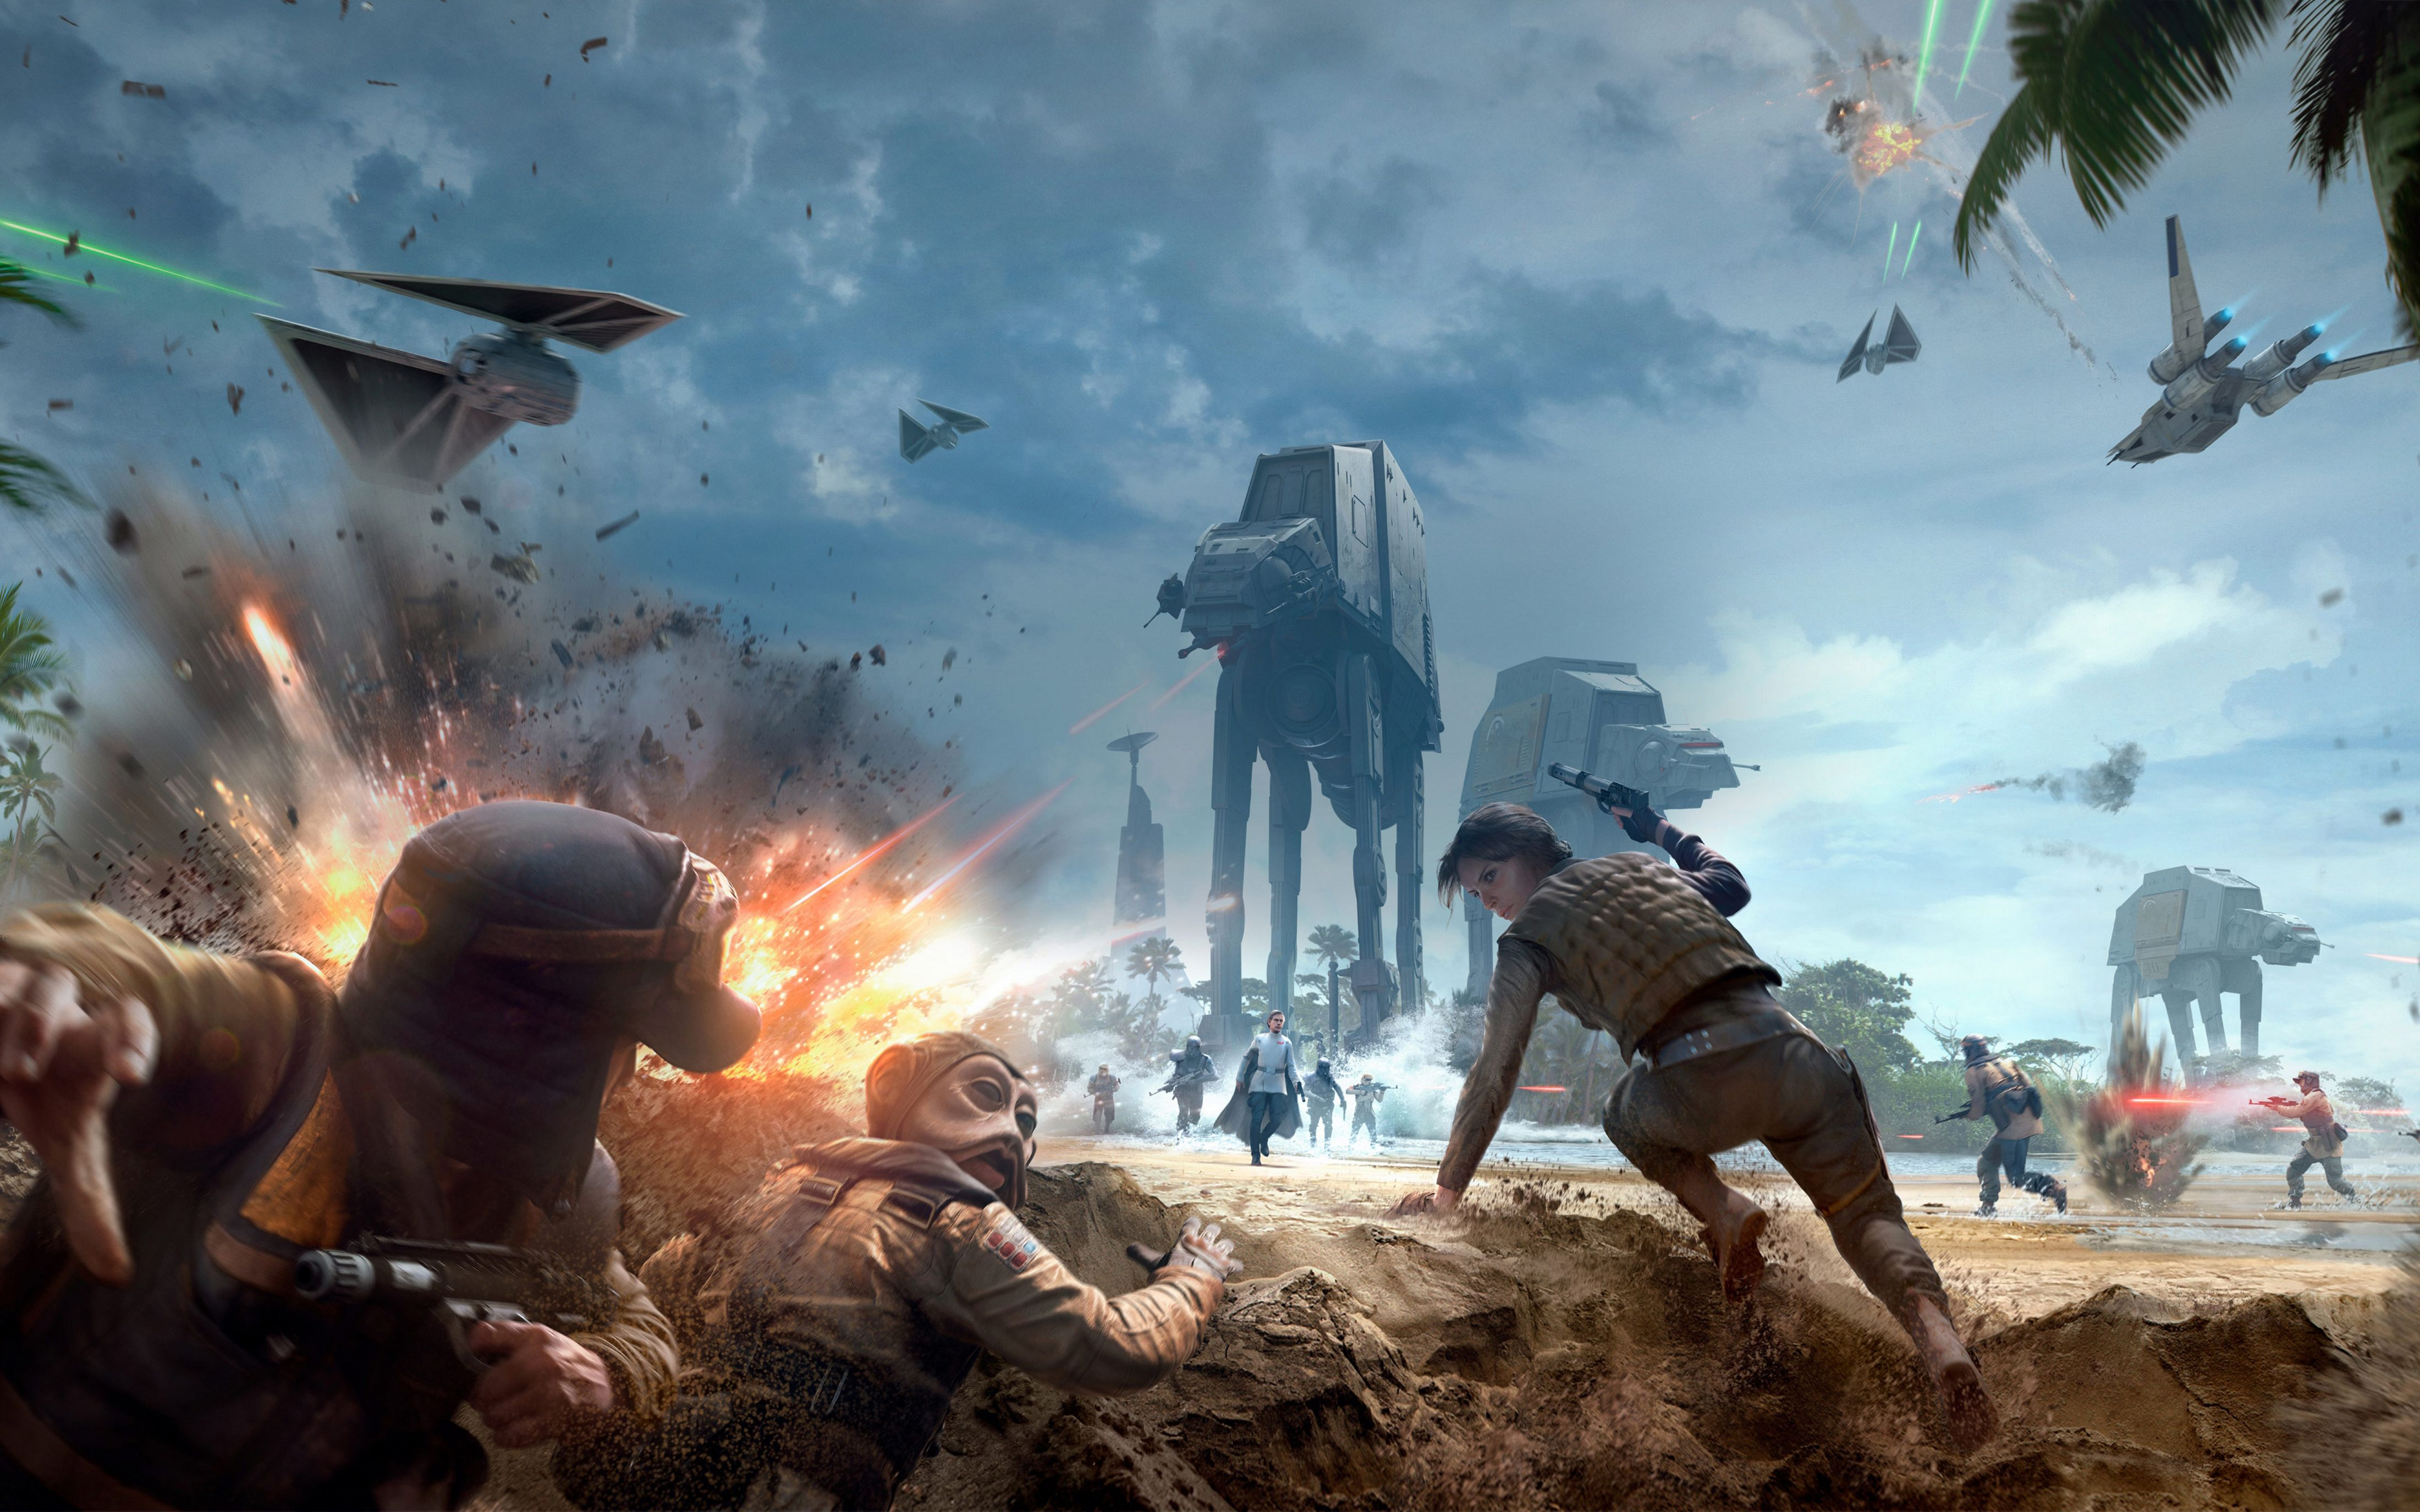 Star Wars Battlefront Rogue One Scarif 4k Star Wars Battlefront Star Wars Video Games Star Wars